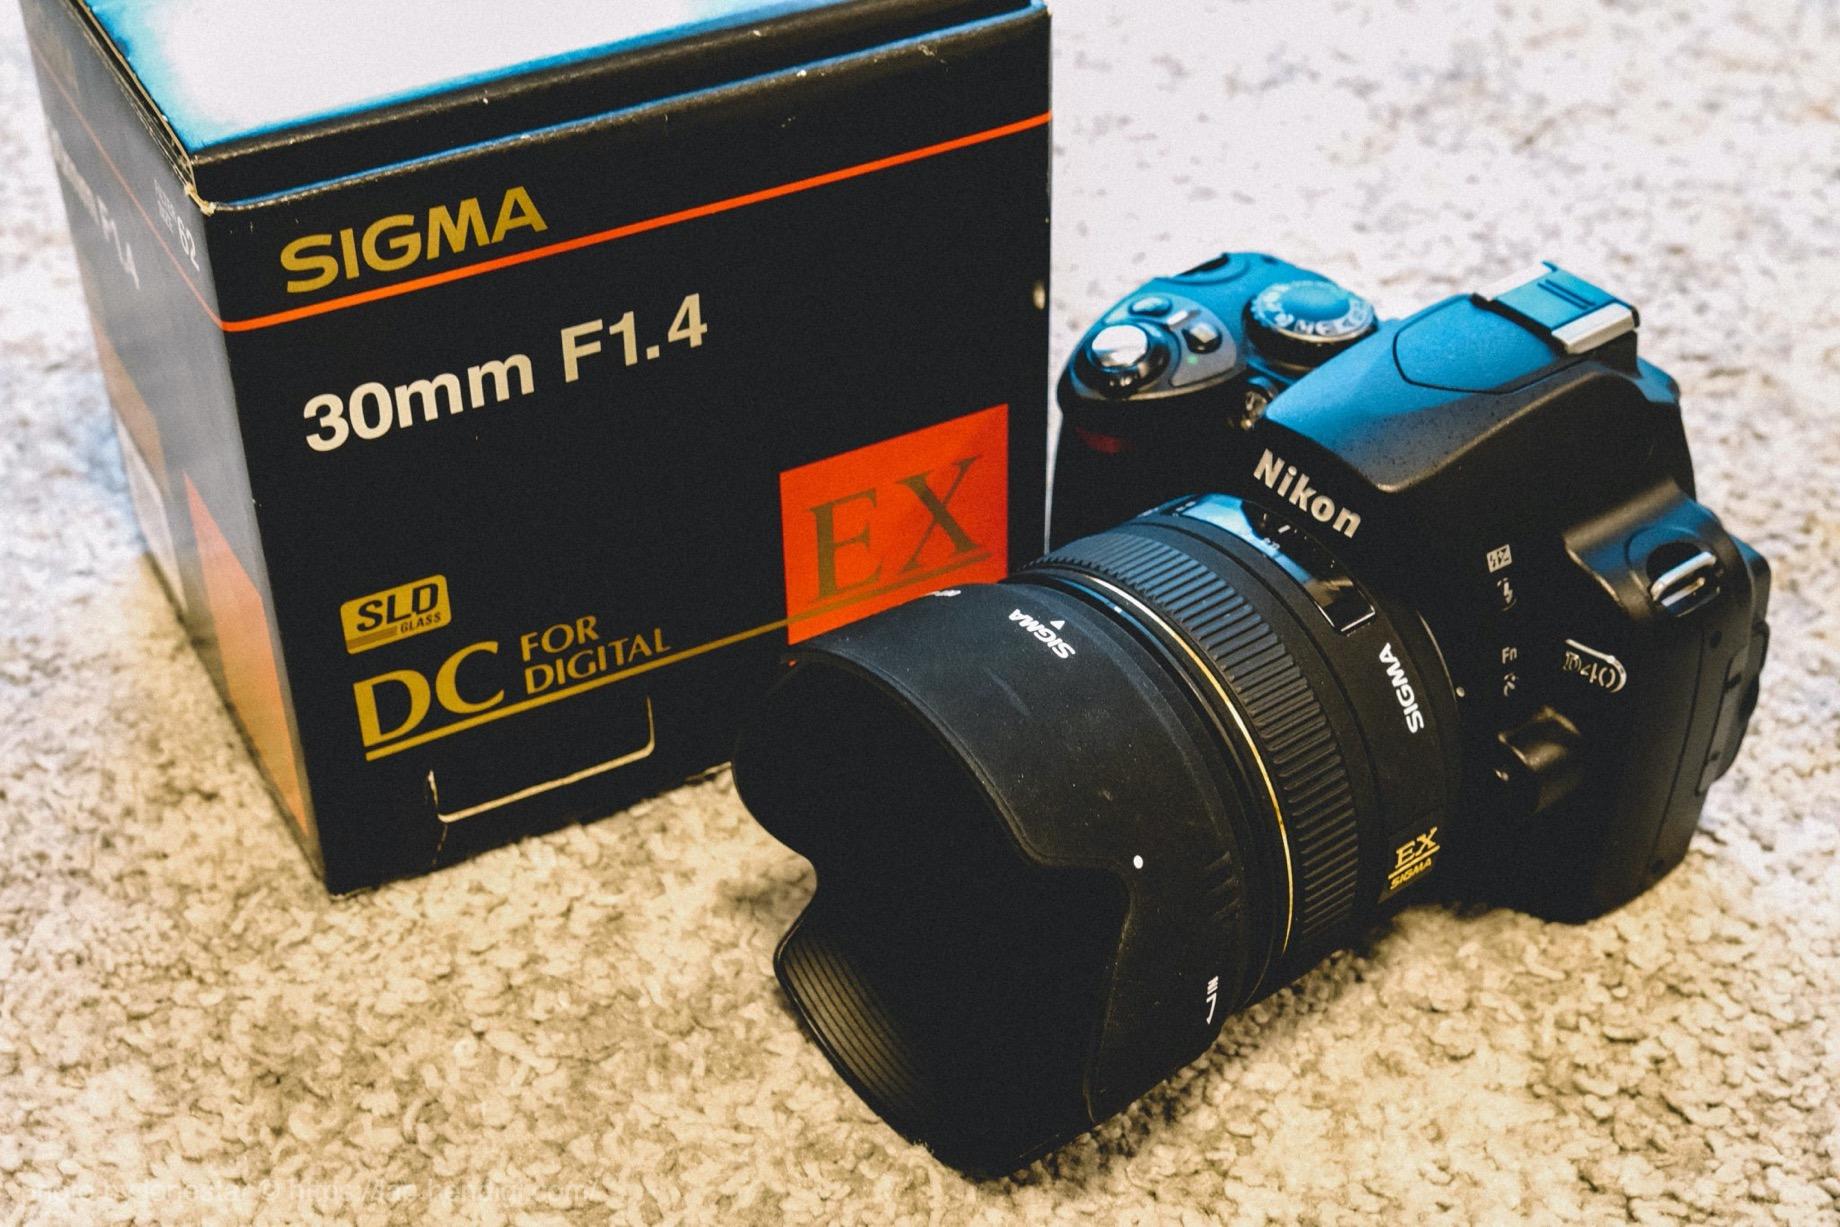 SIGMA 30mm F1.4EX DC HSM